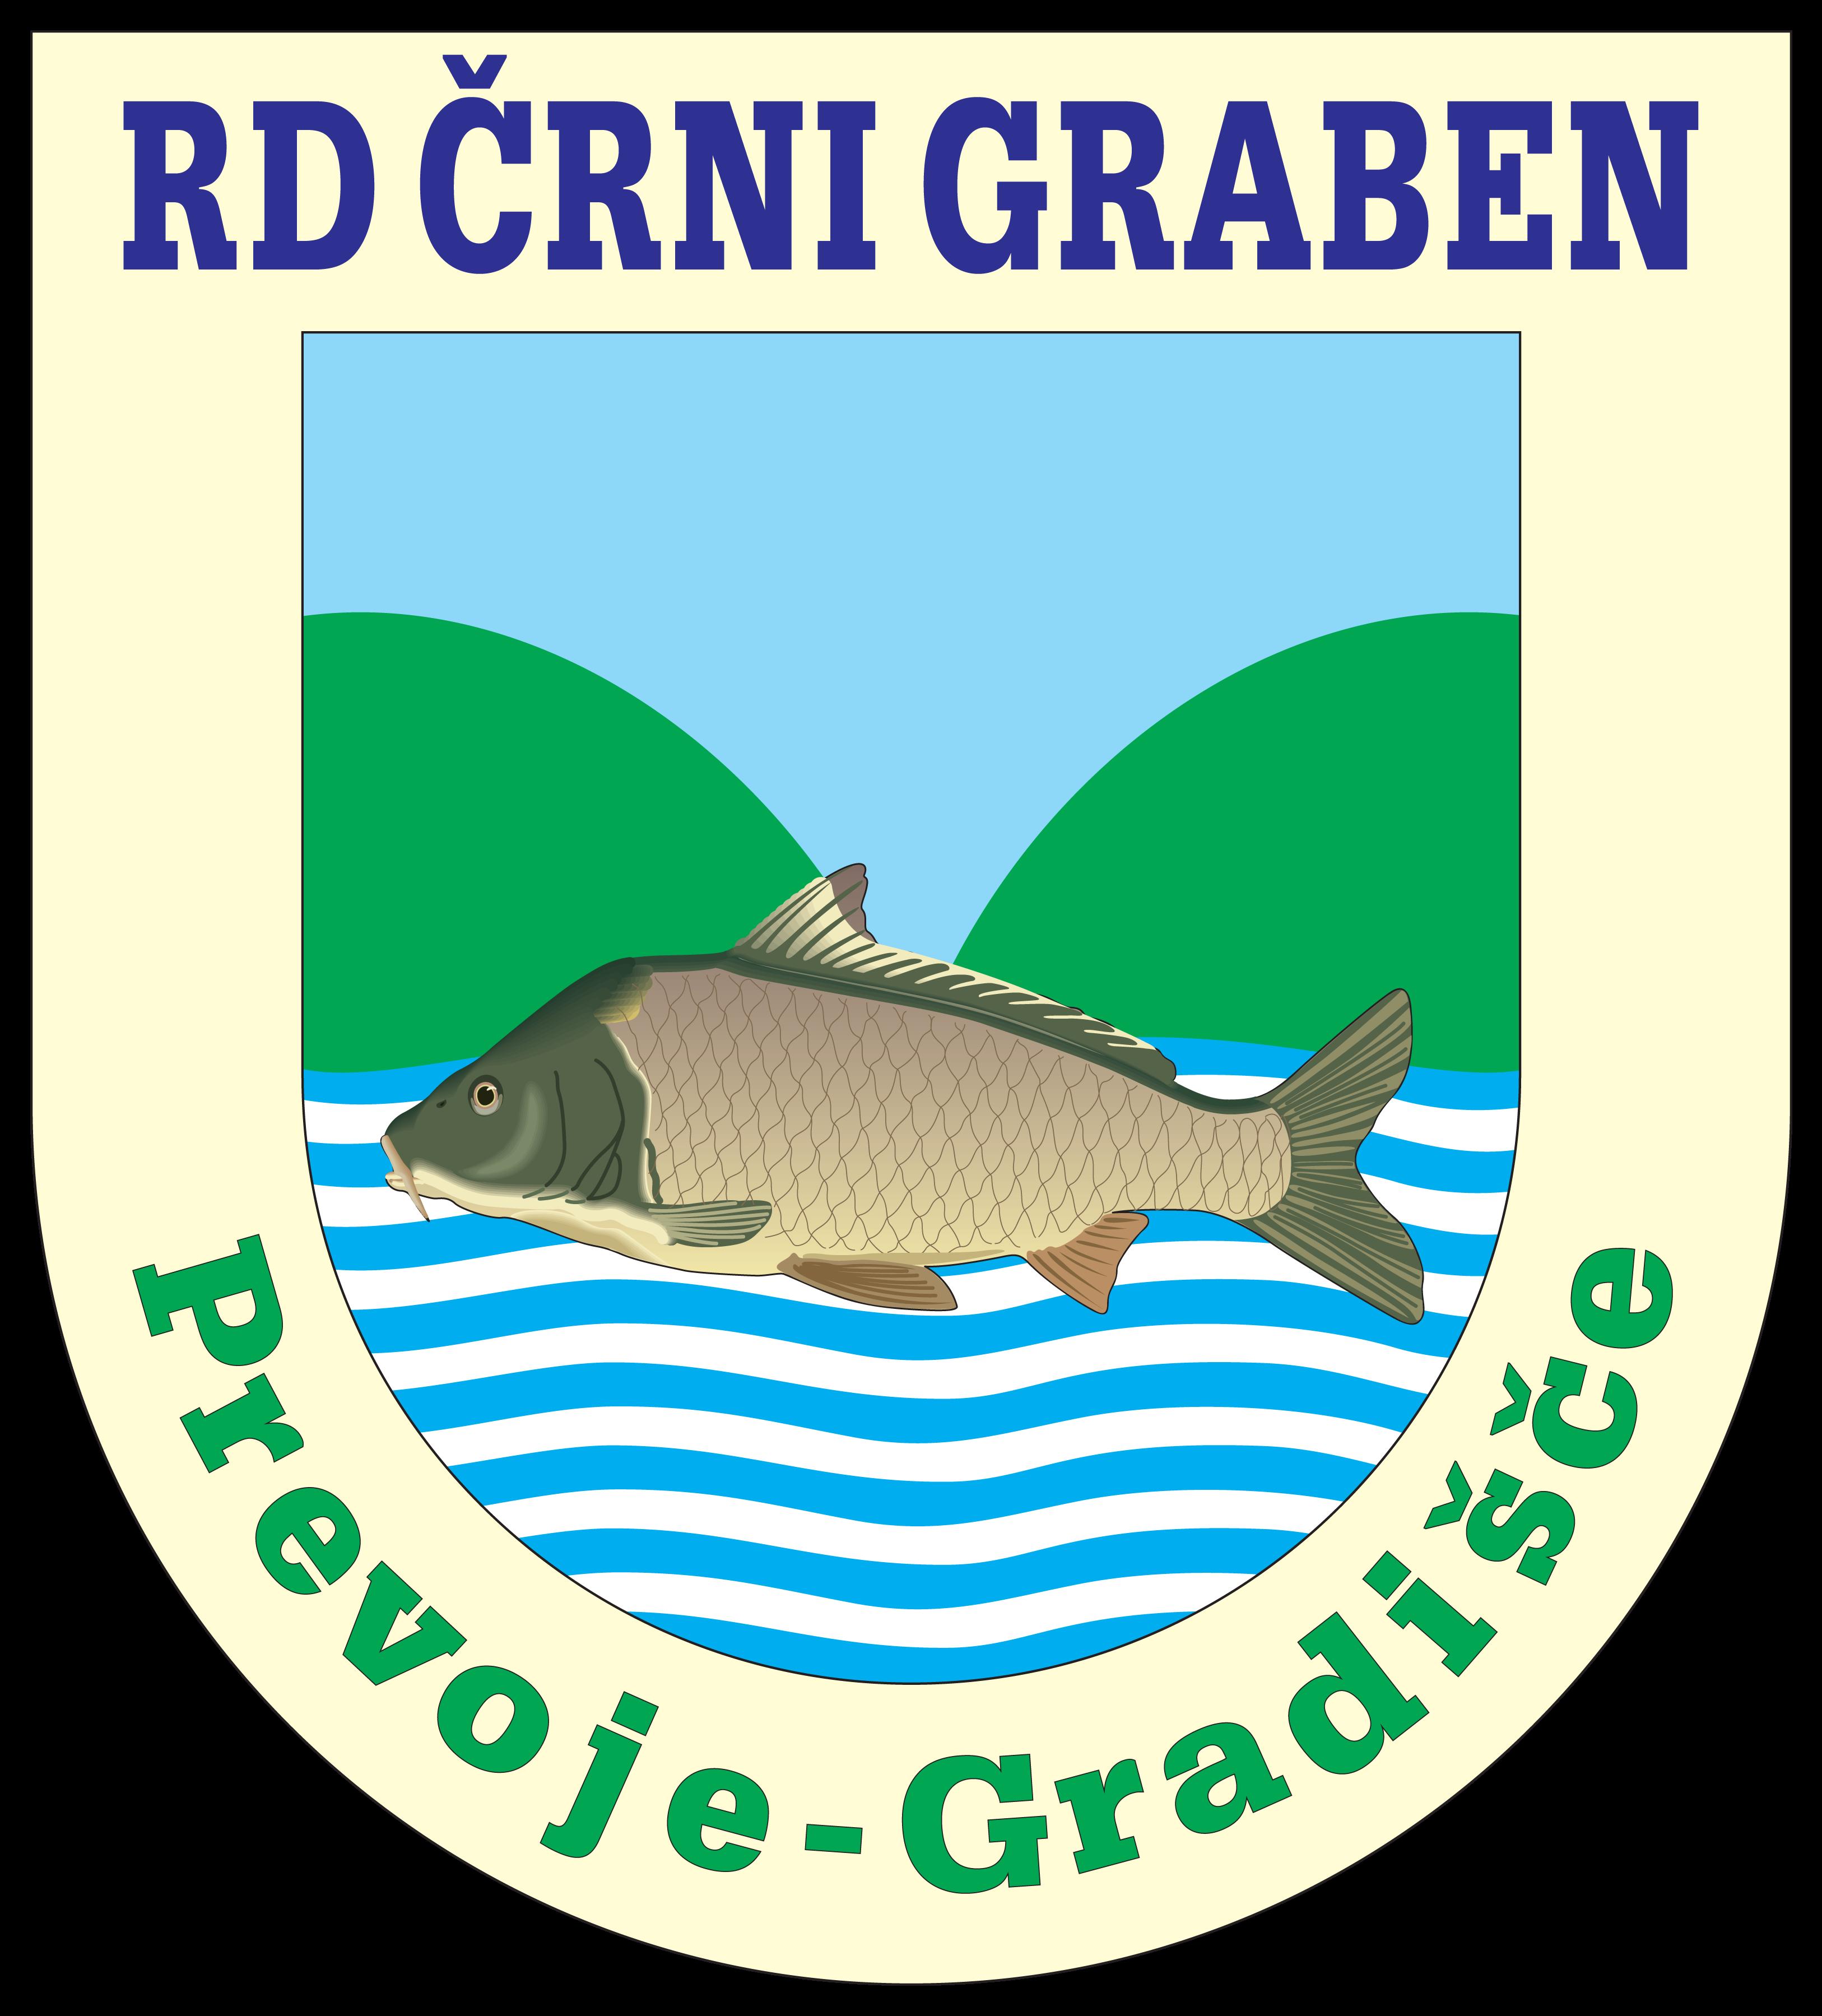 RD Crnigraben